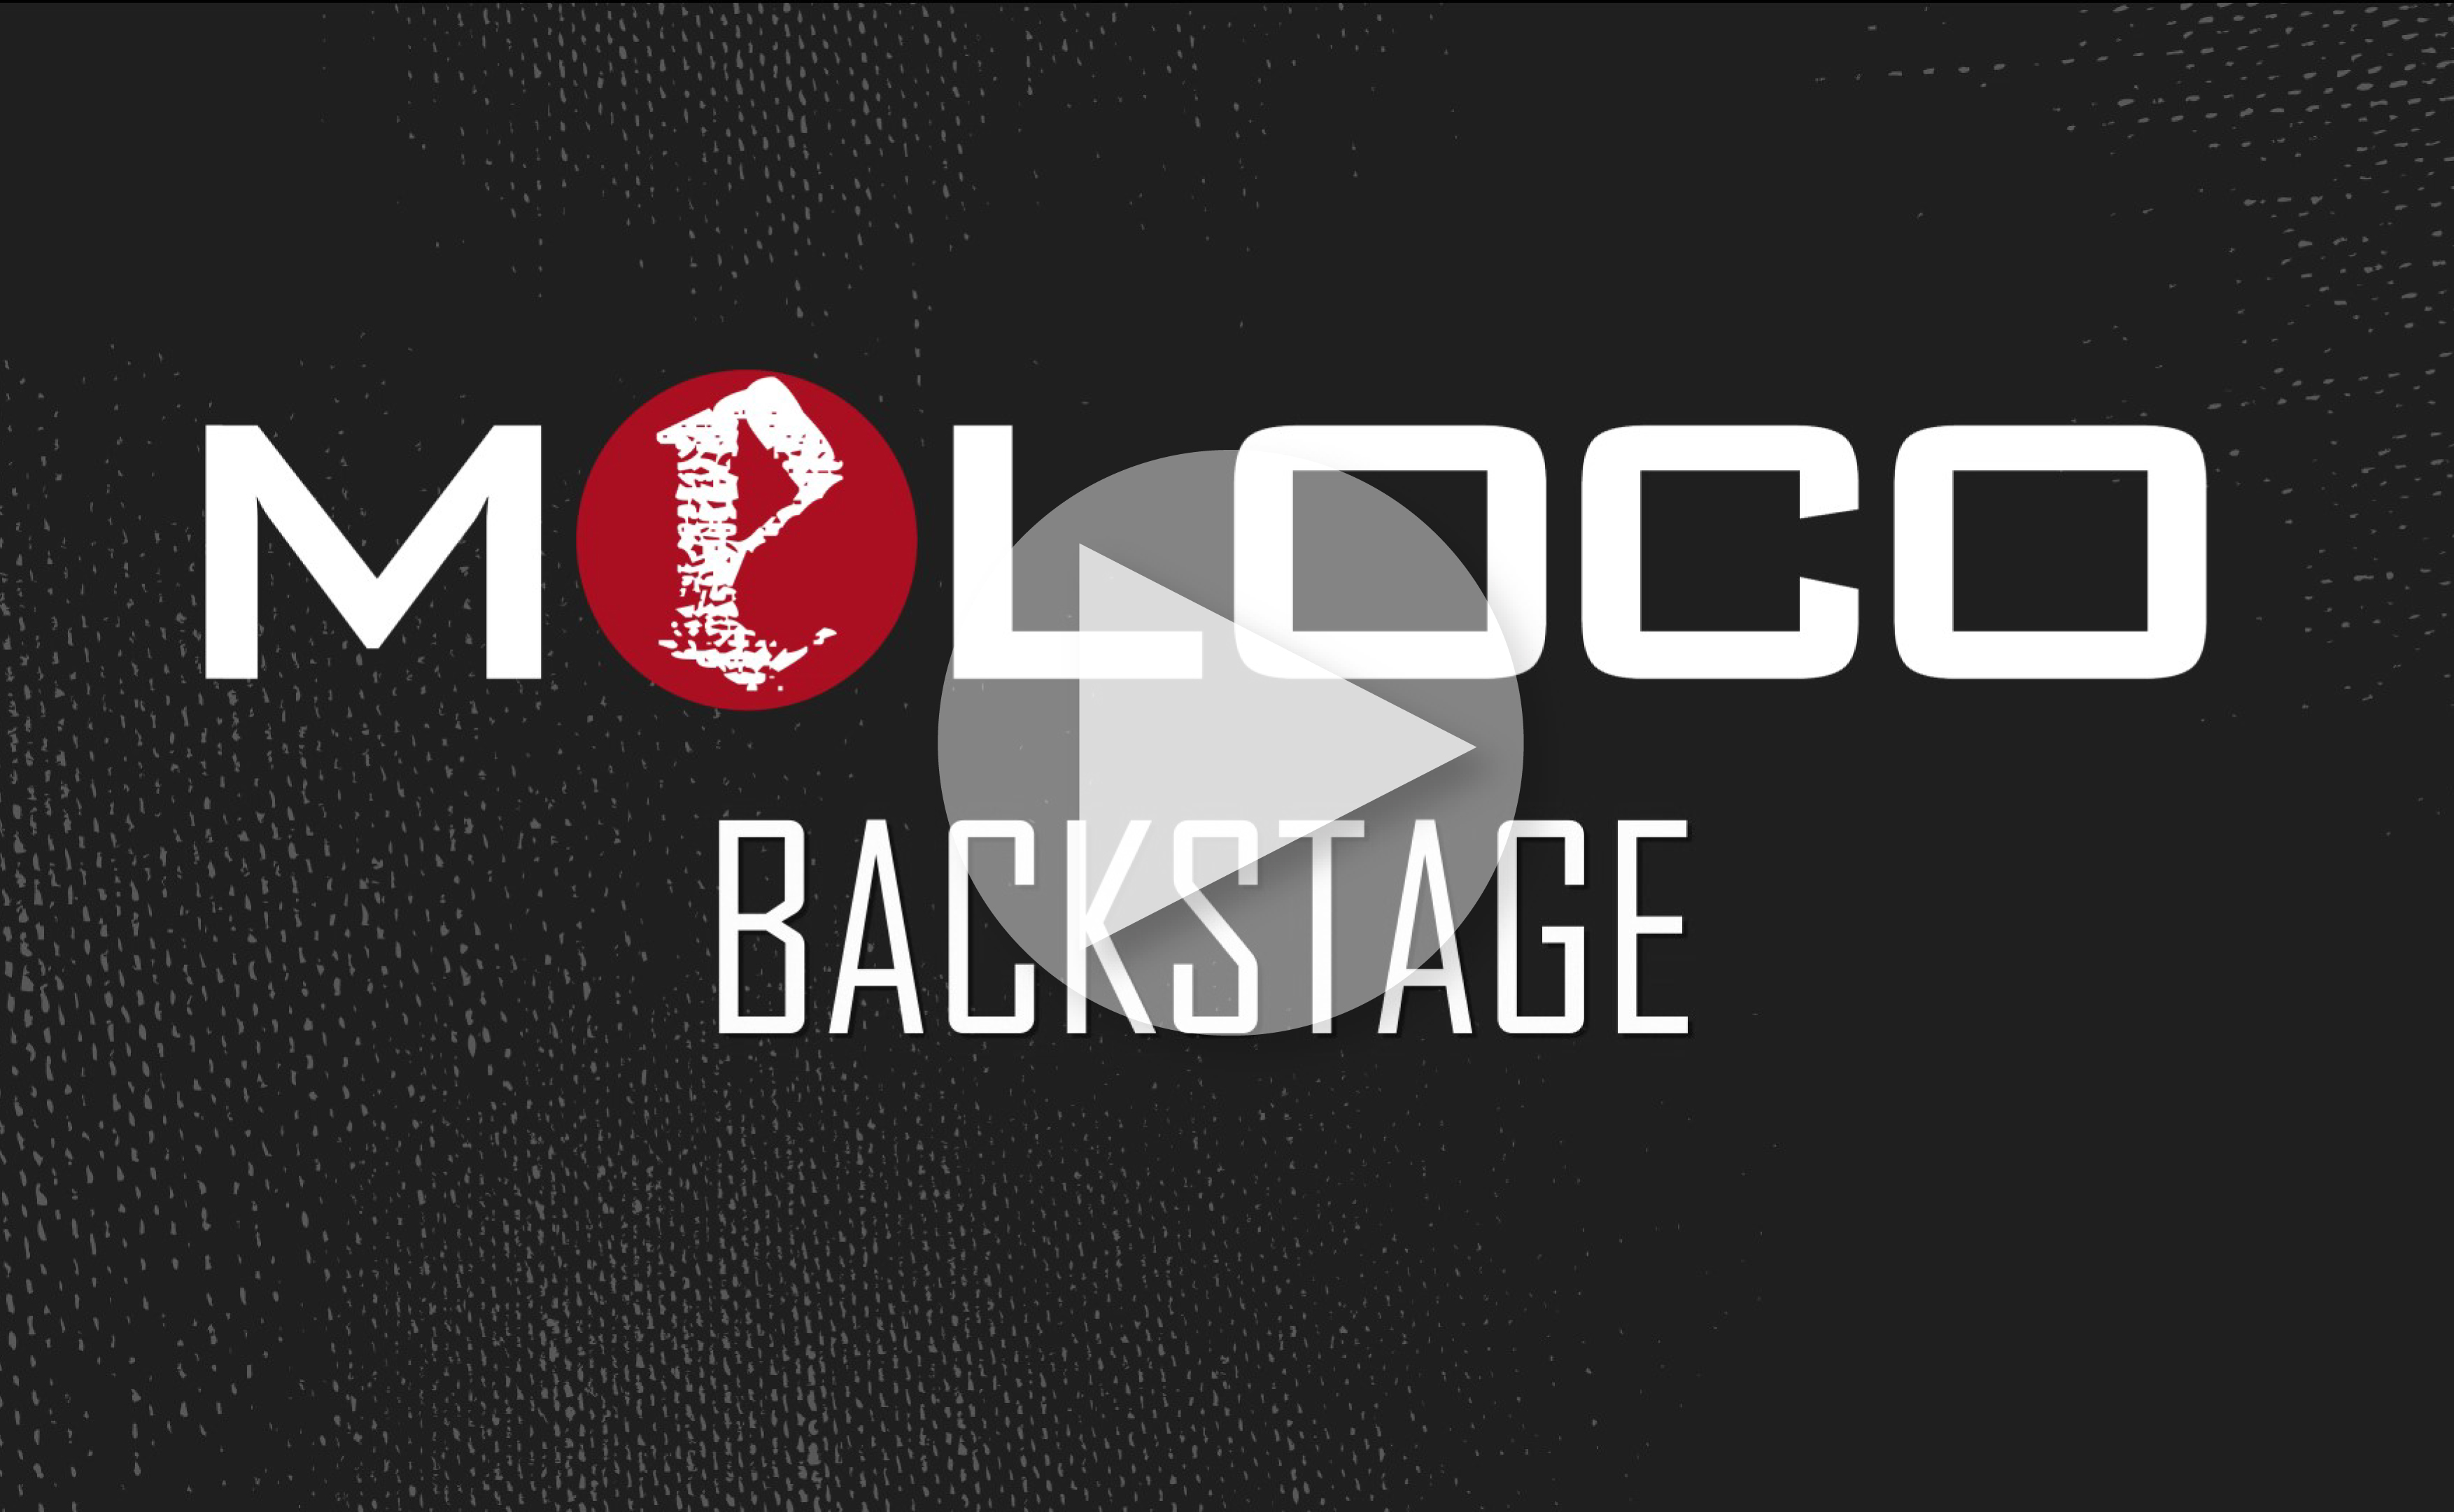 MeLOCO Backstage